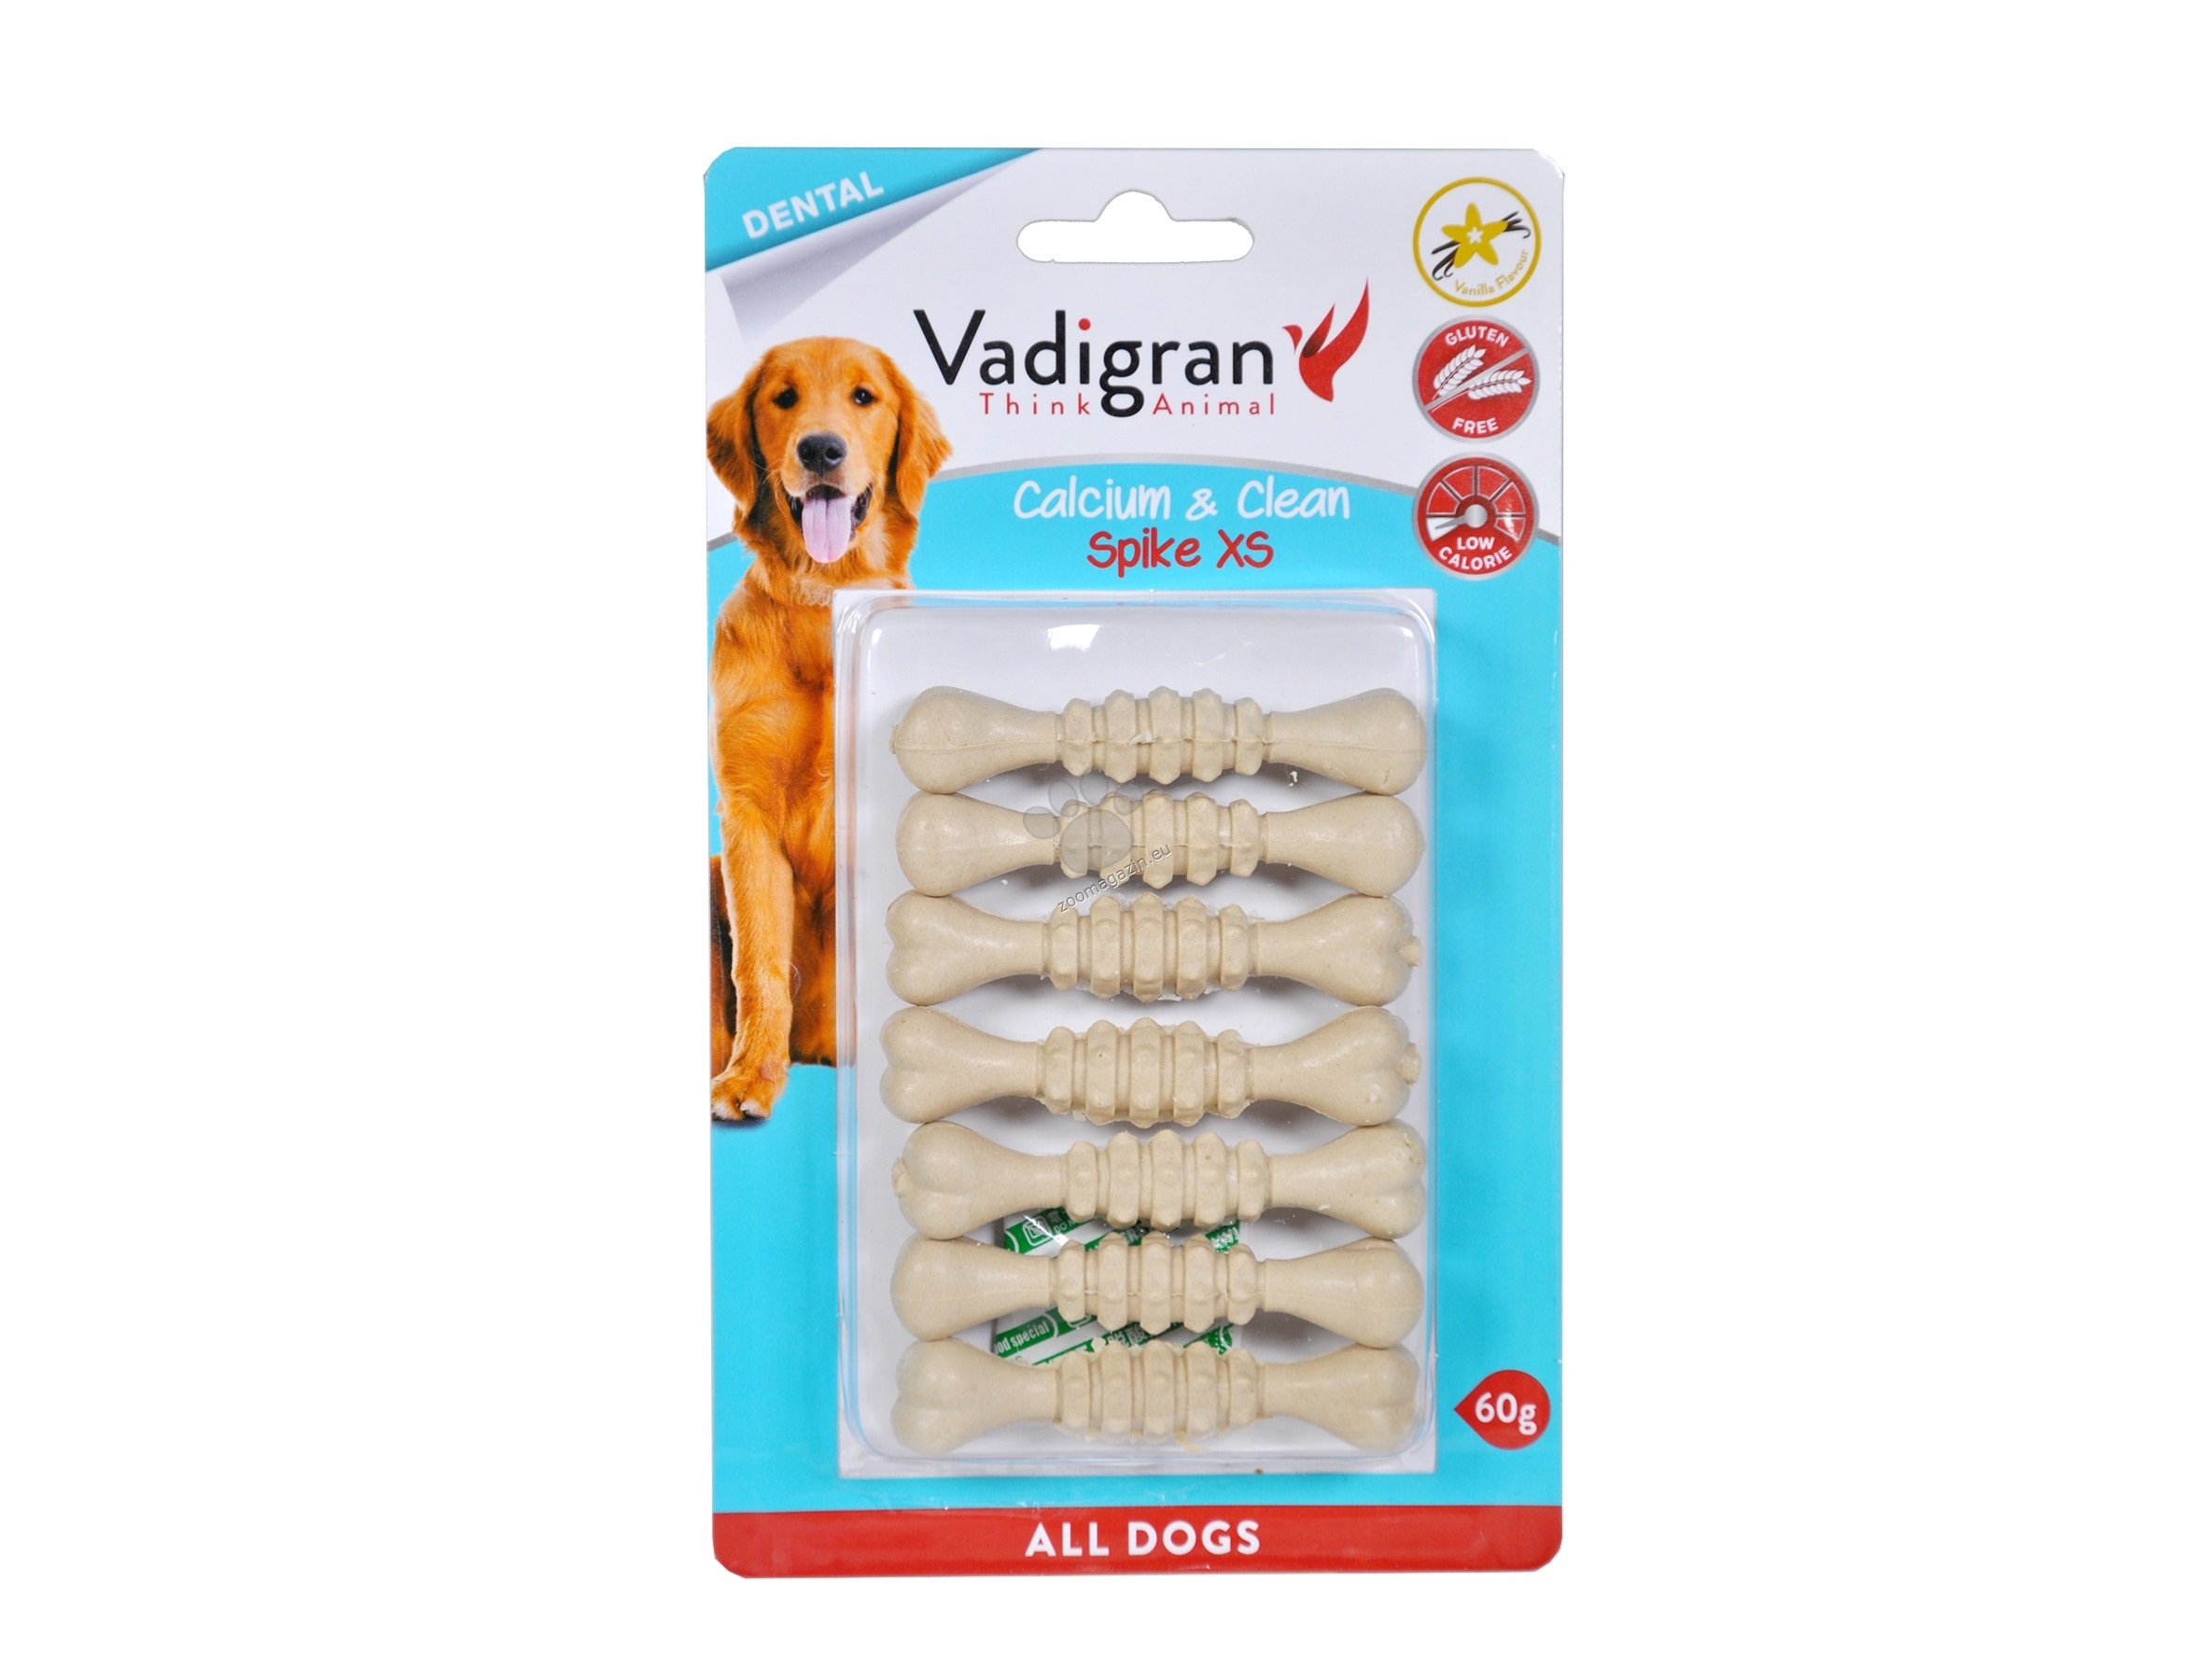 Vadigran - Pressed Chevbone Calcium & Clean - калциево кокалче, за висока устна хигиена 60 гр. / 7 см.